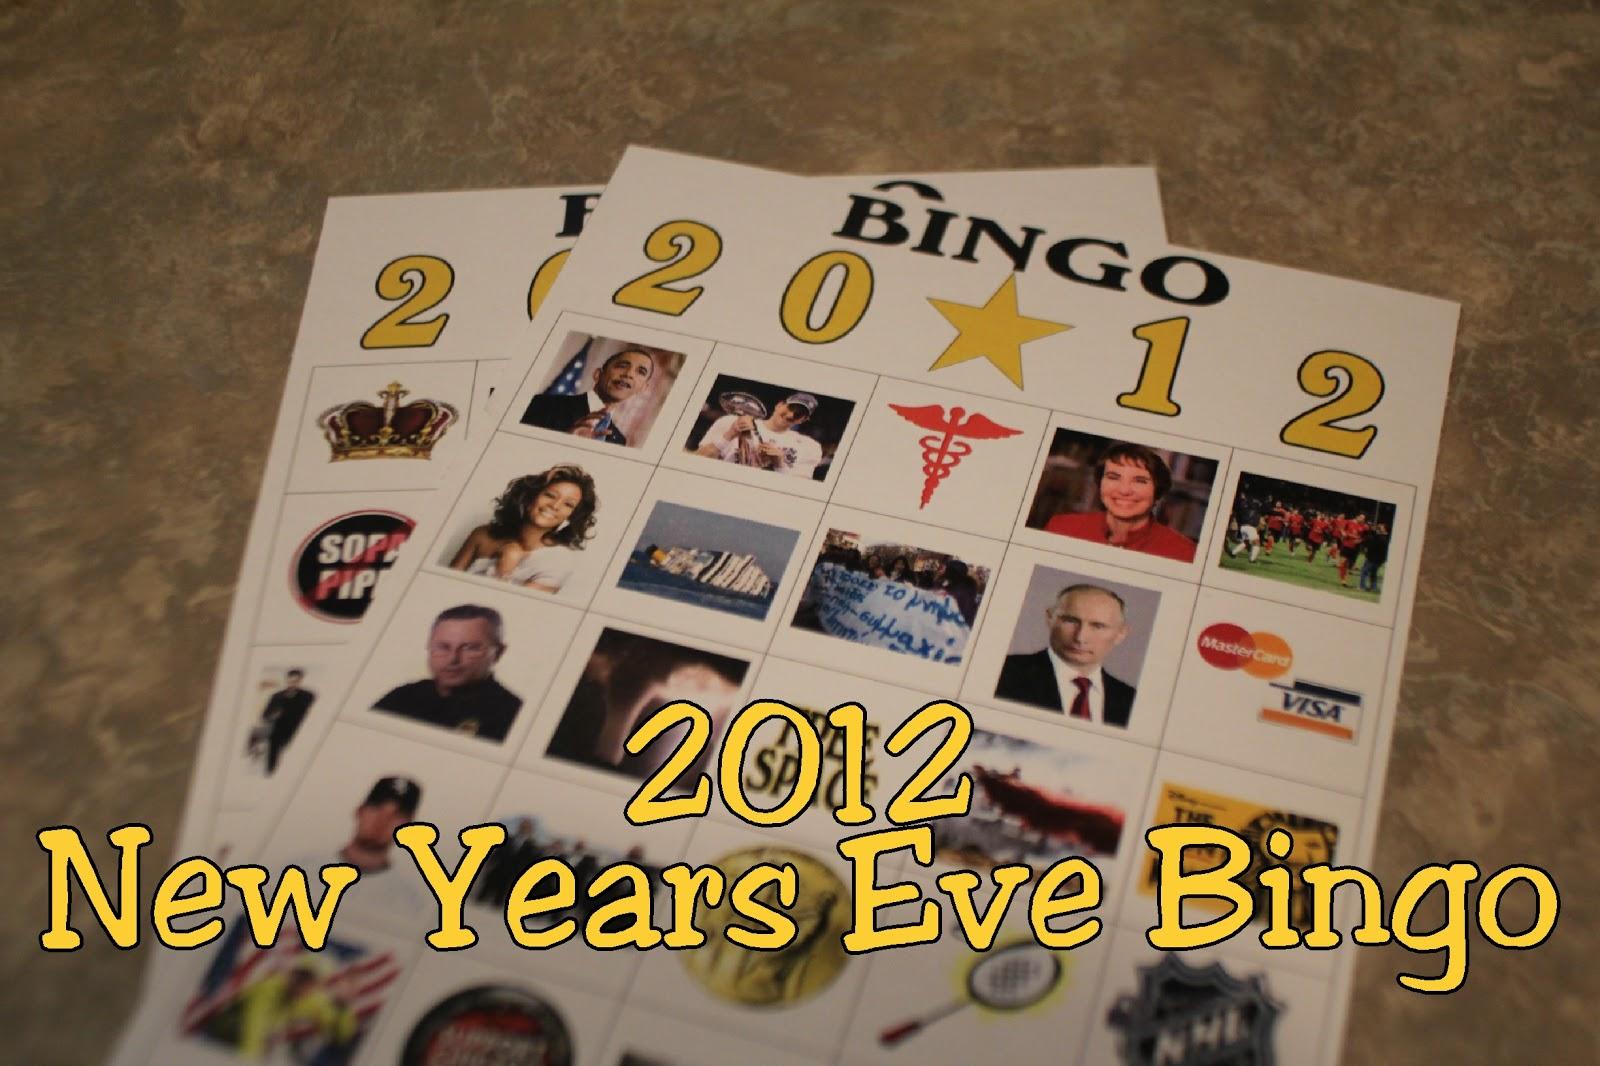 http://3.bp.blogspot.com/-06y5R_fKNVI/UN5sW7MHD1I/AAAAAAAAFZU/_bGHRWQ73Ck/s1600/New+Years+Eve+Bingo.jpg